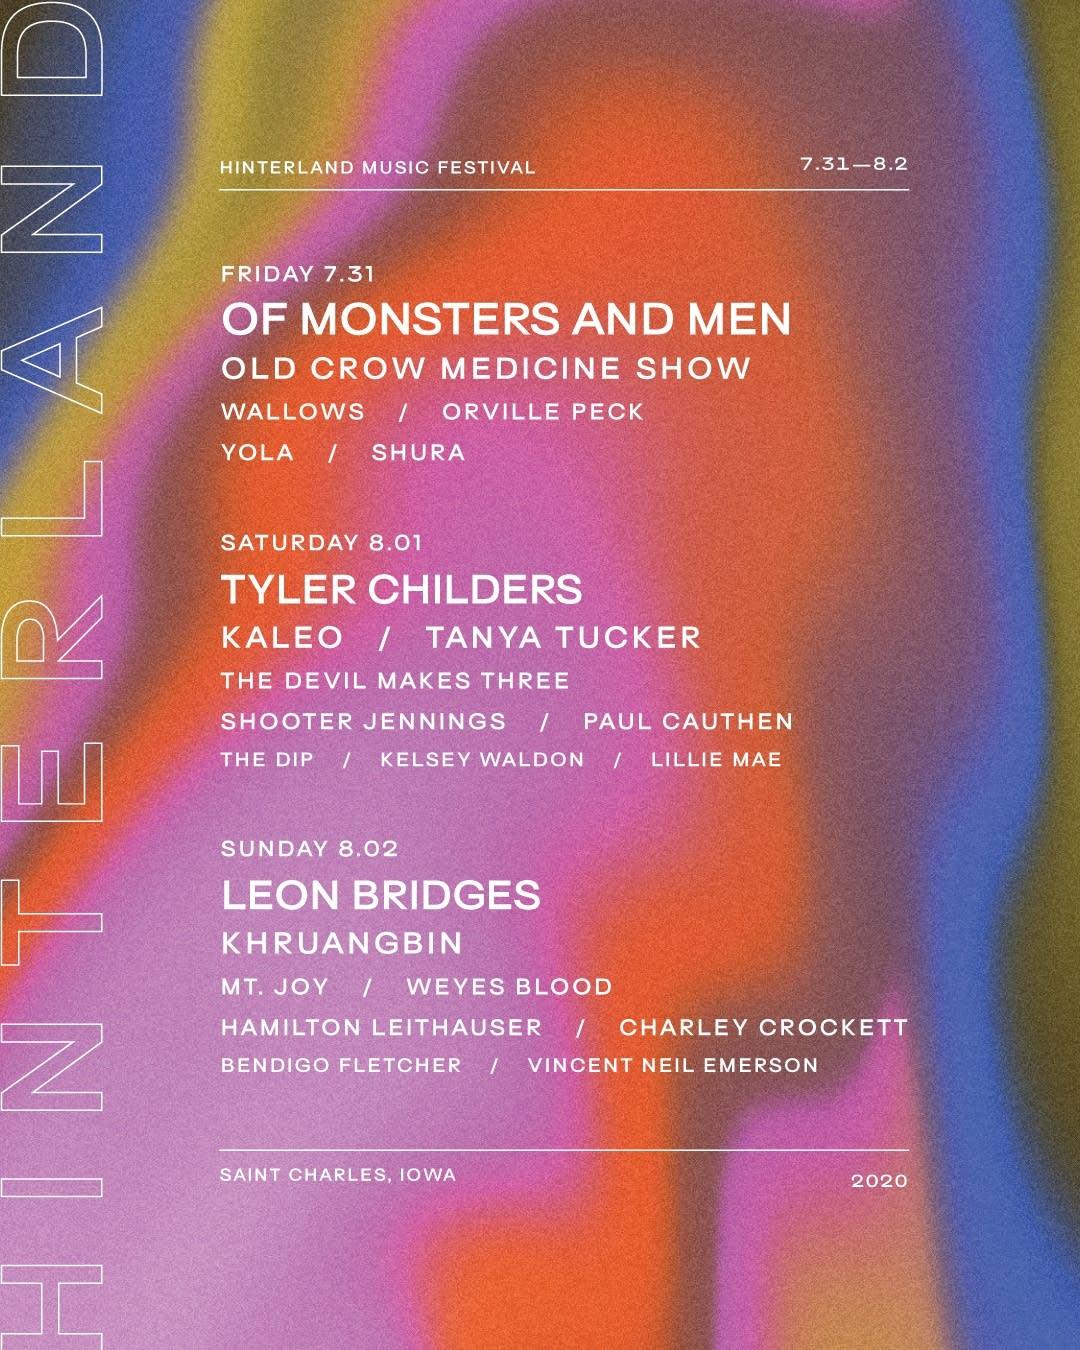 Hinterland Music Festival lineup 2020.